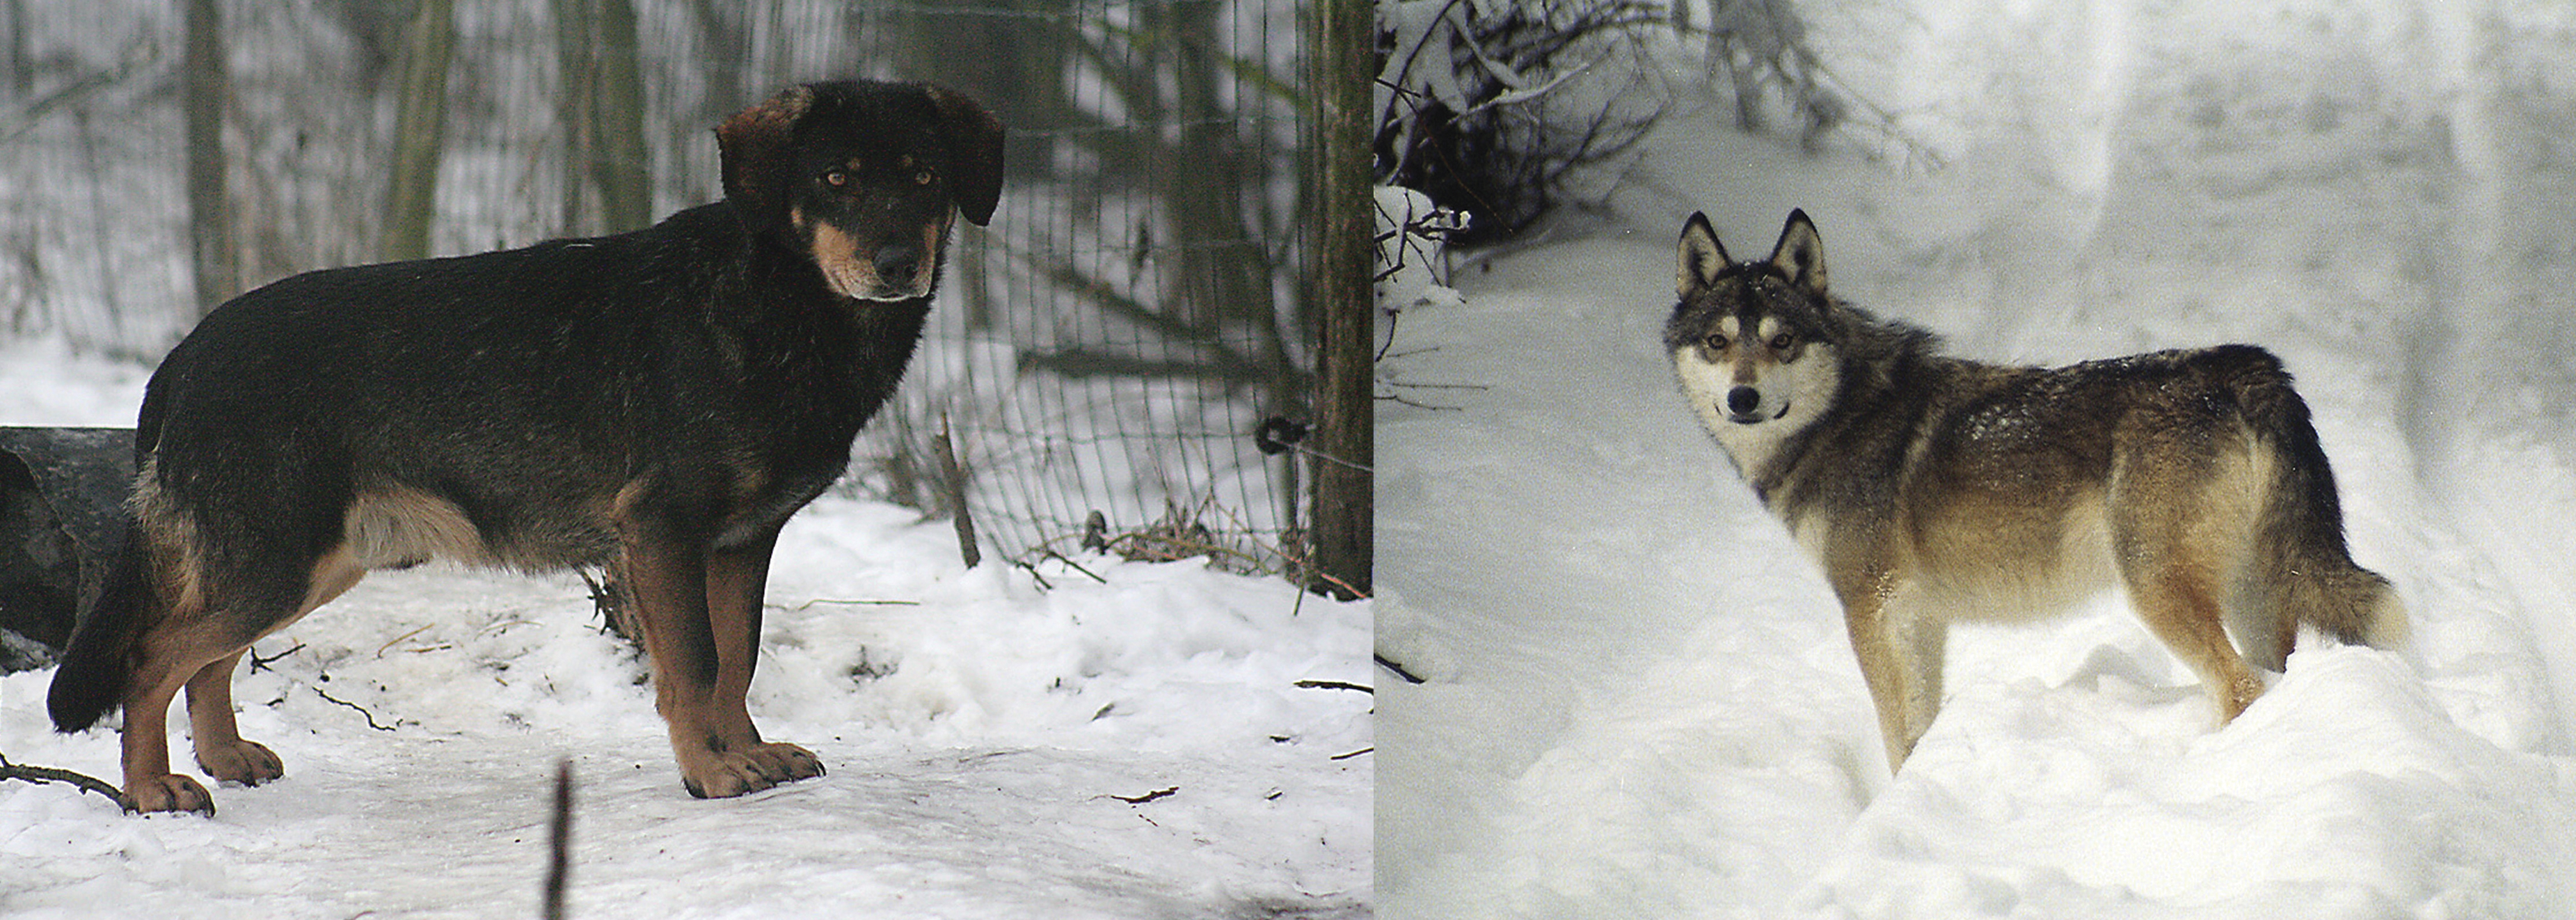 File:F1 wolf-dog hybrids from Wildlife Park Kadzidlowo, Poland.png ...